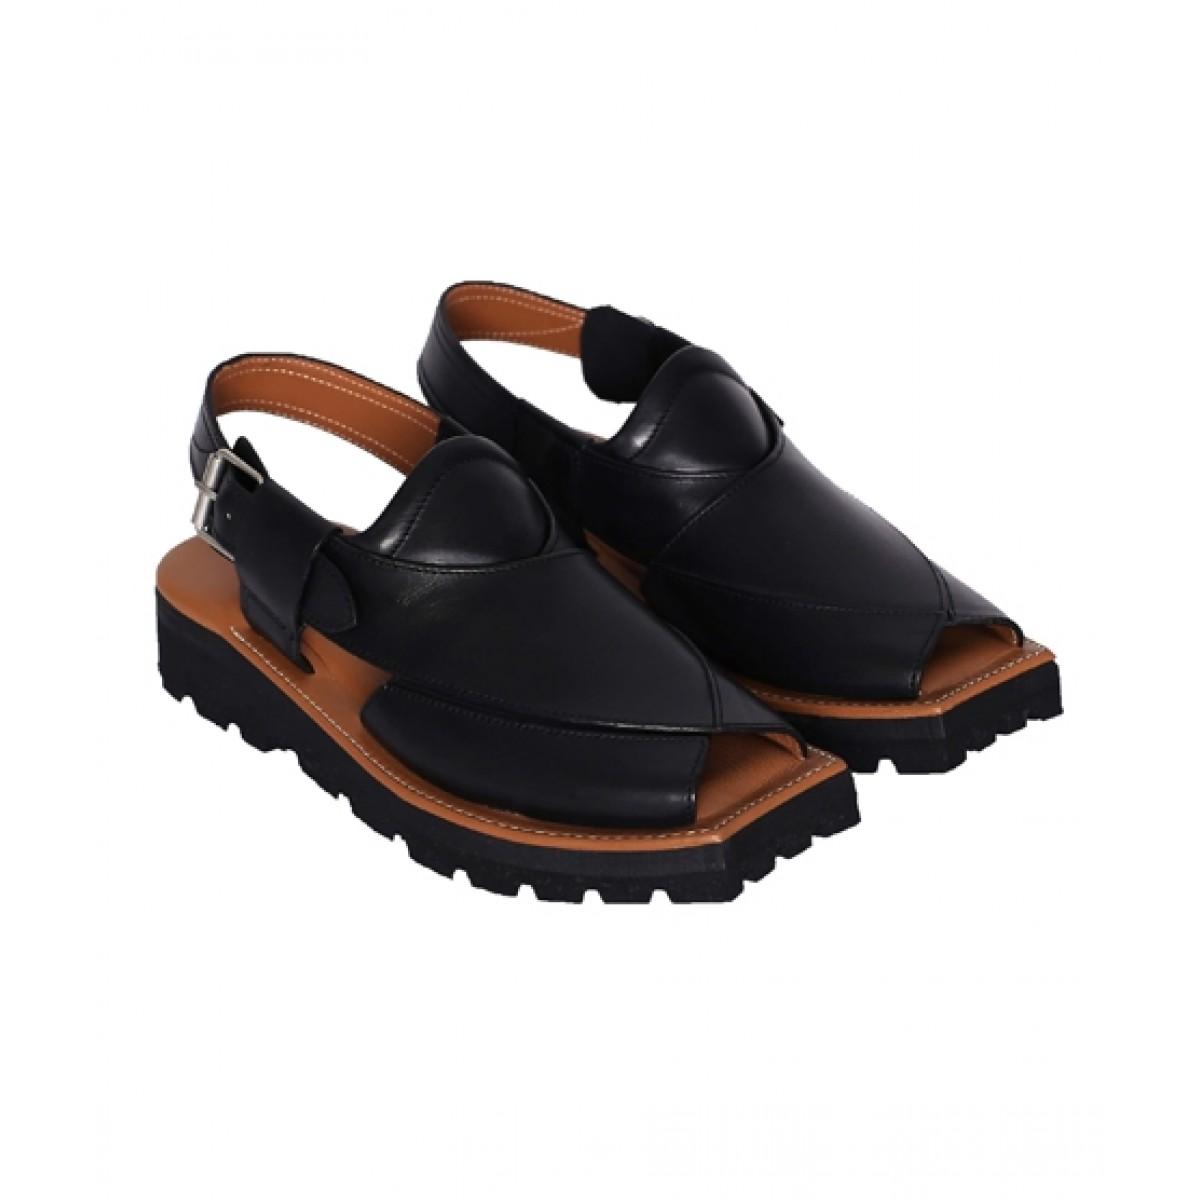 NOVADO Kaptaan Leather Peshawari Sandal For Men Black (0046)